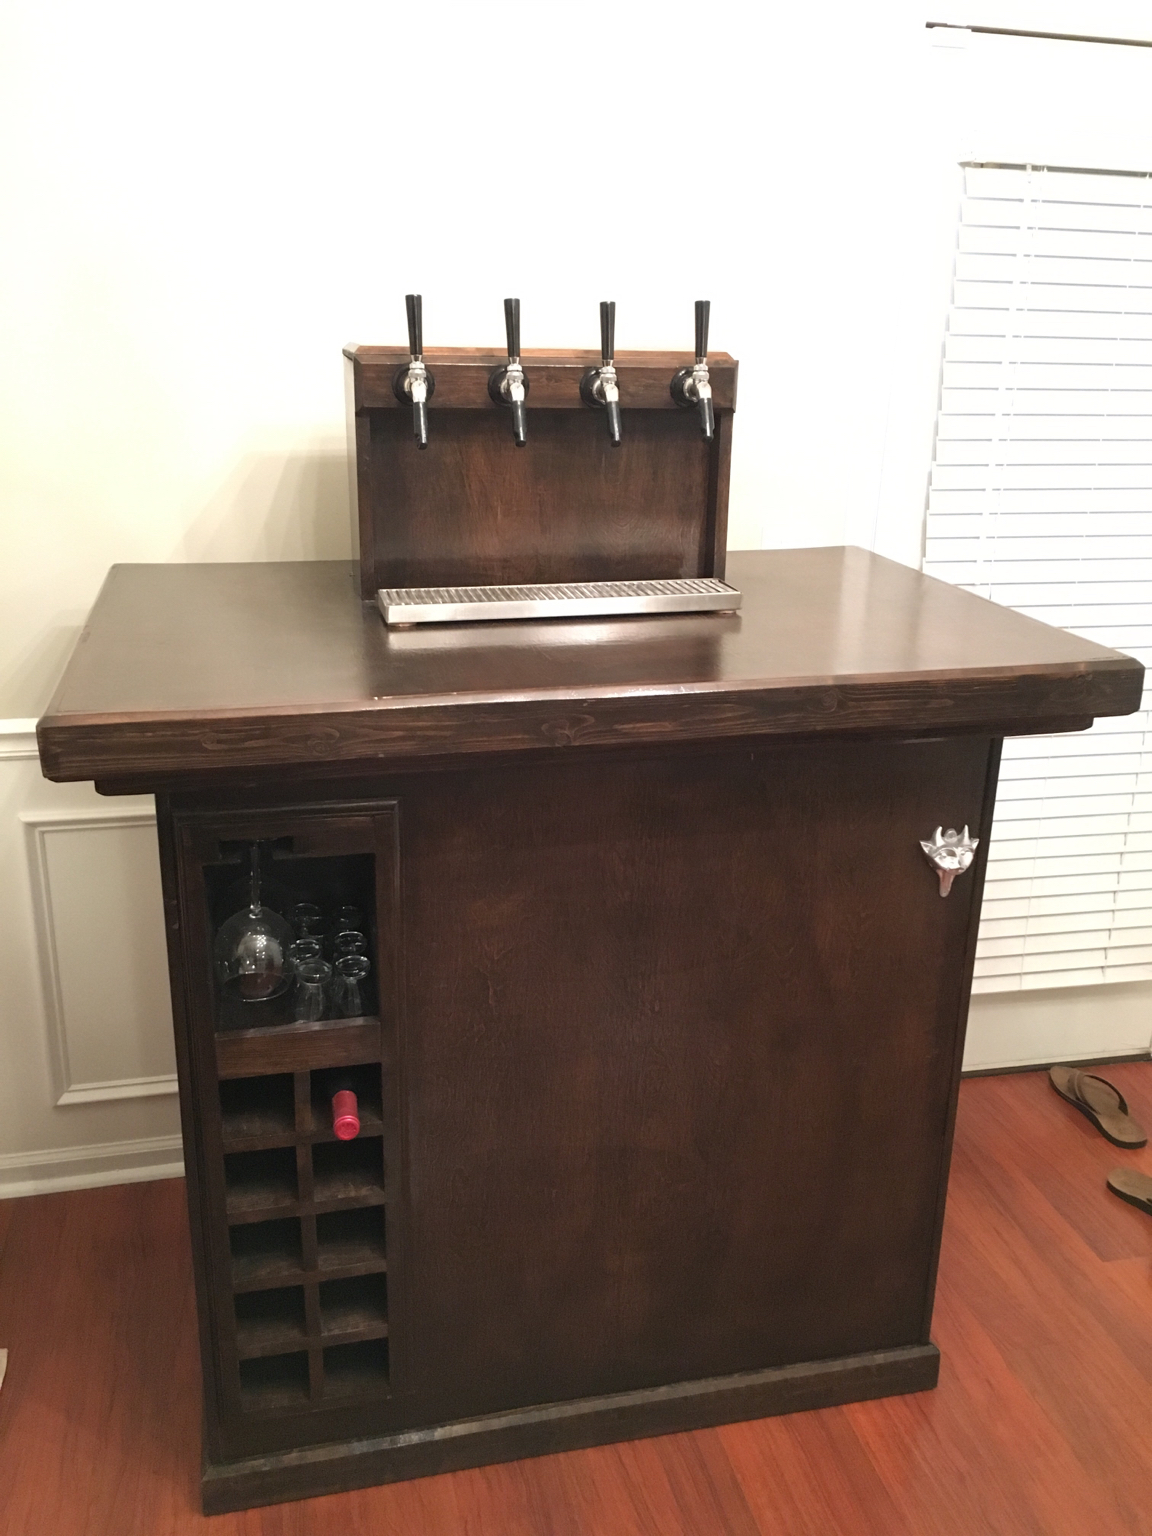 Home Bar Build With Kegerator Homebrewtalk Com Beer Wine Mead